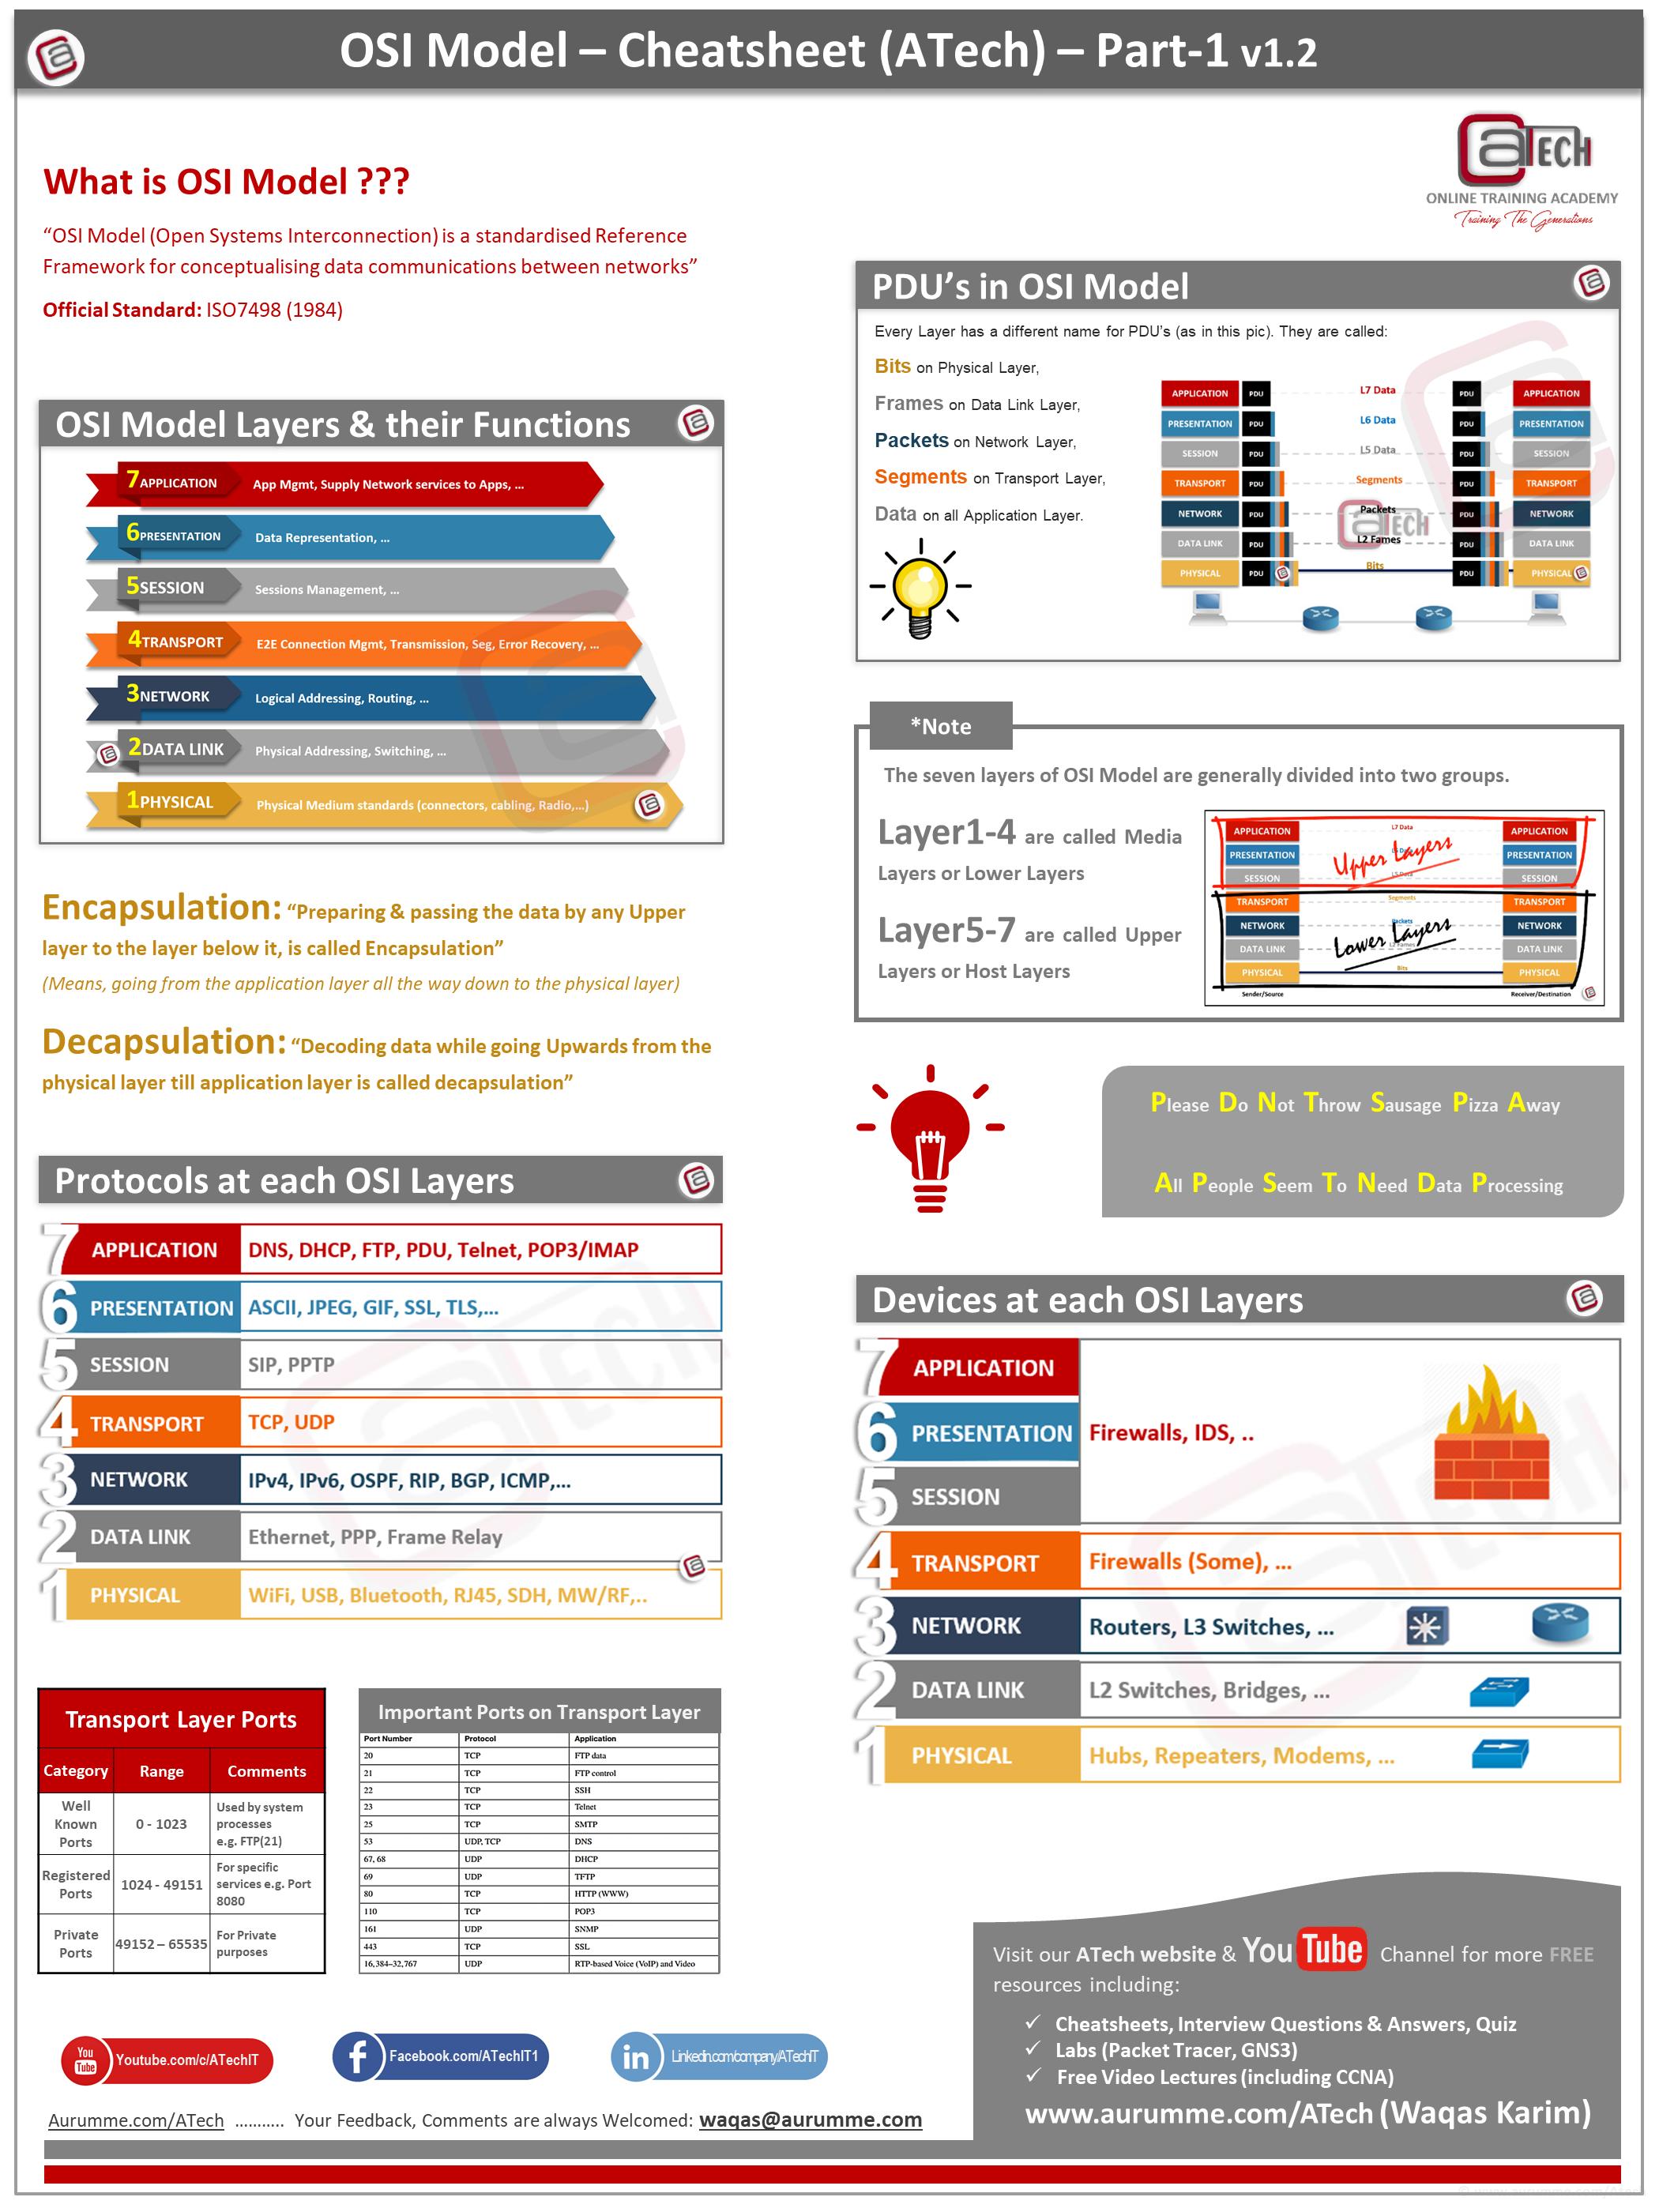 OSI Model Cheatsheet - Cisco Community